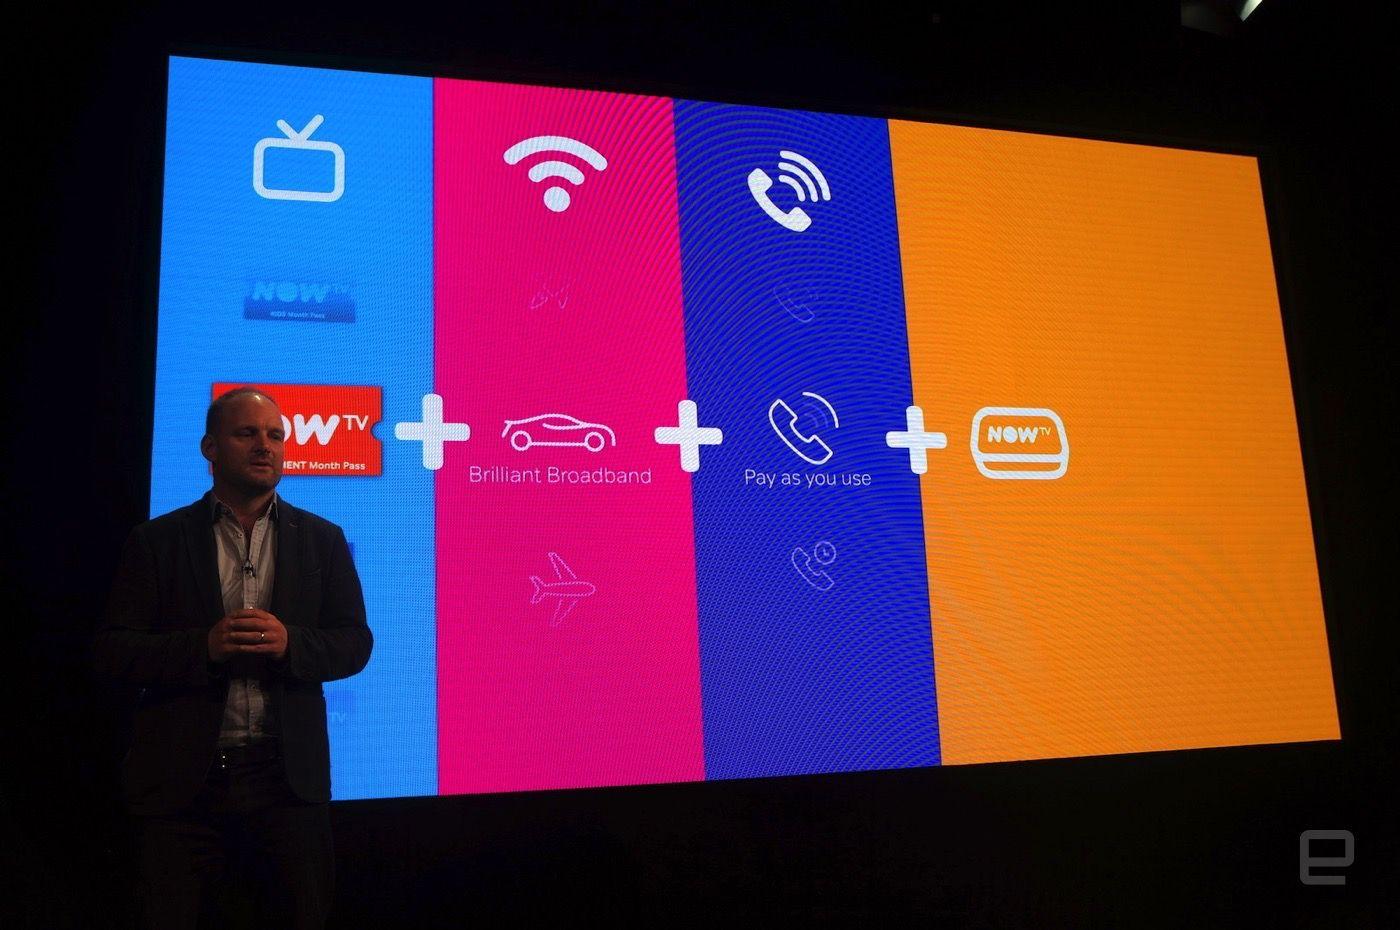 Sky S Now Tv Combo Unites Live Tv Streaming Phone And Broadband Live Tv Streaming Live Tv Streaming Tv